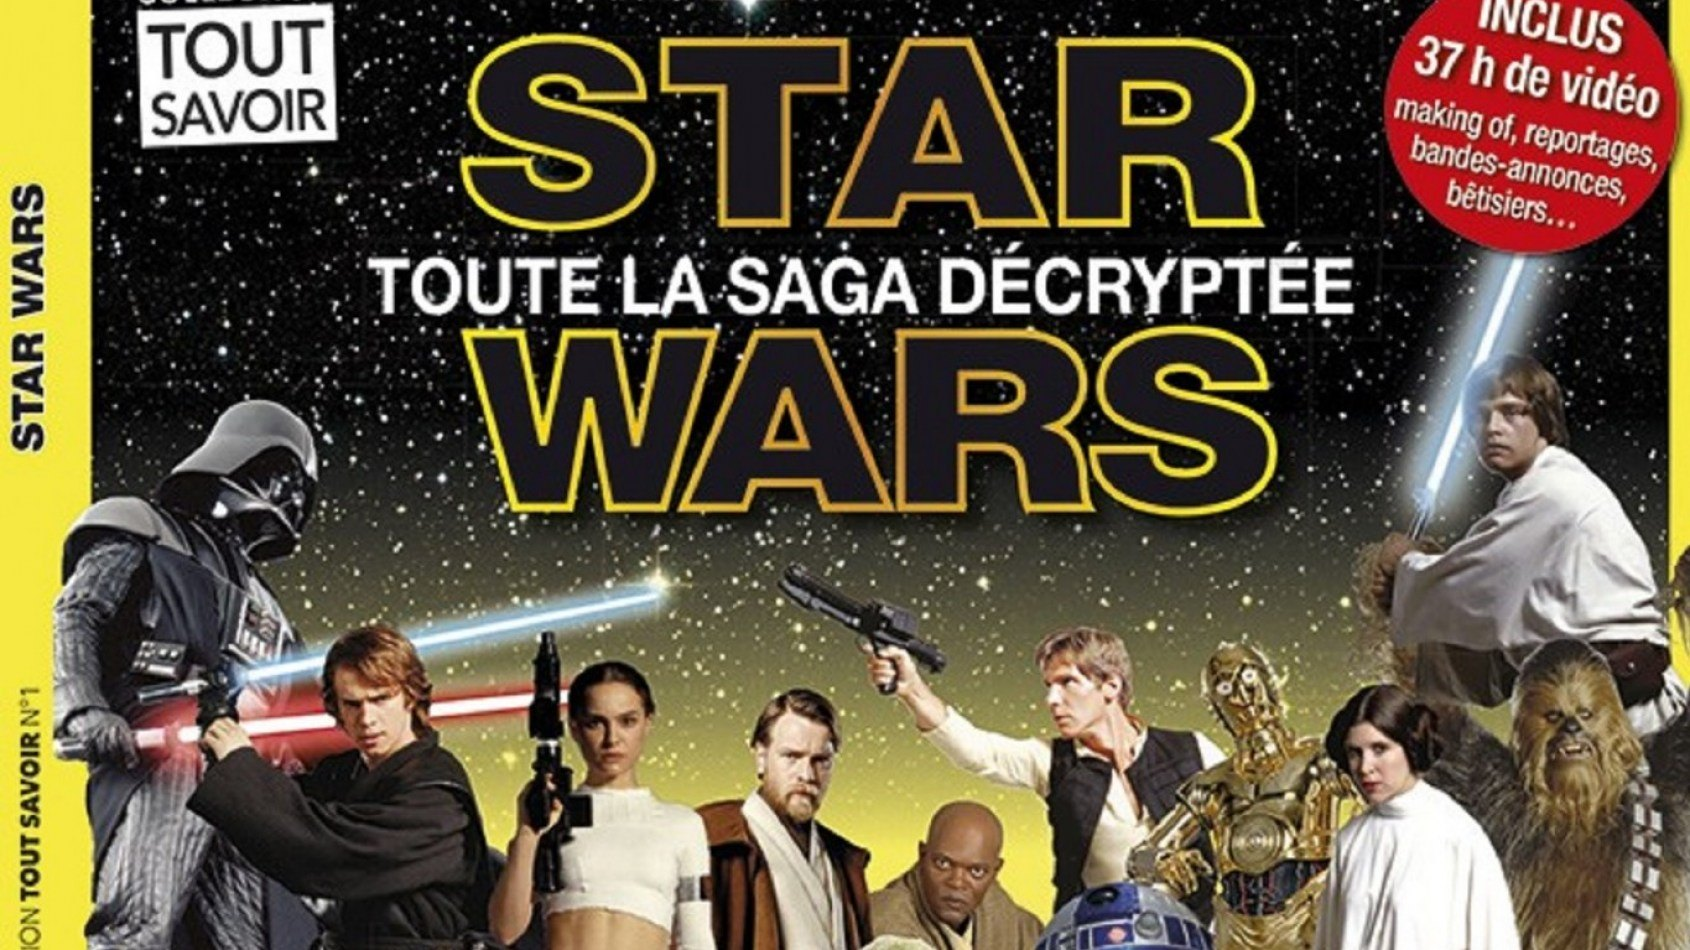 [Diverti] Le magazine Tout Savoir n�1 d�crypte la saga Star Wars